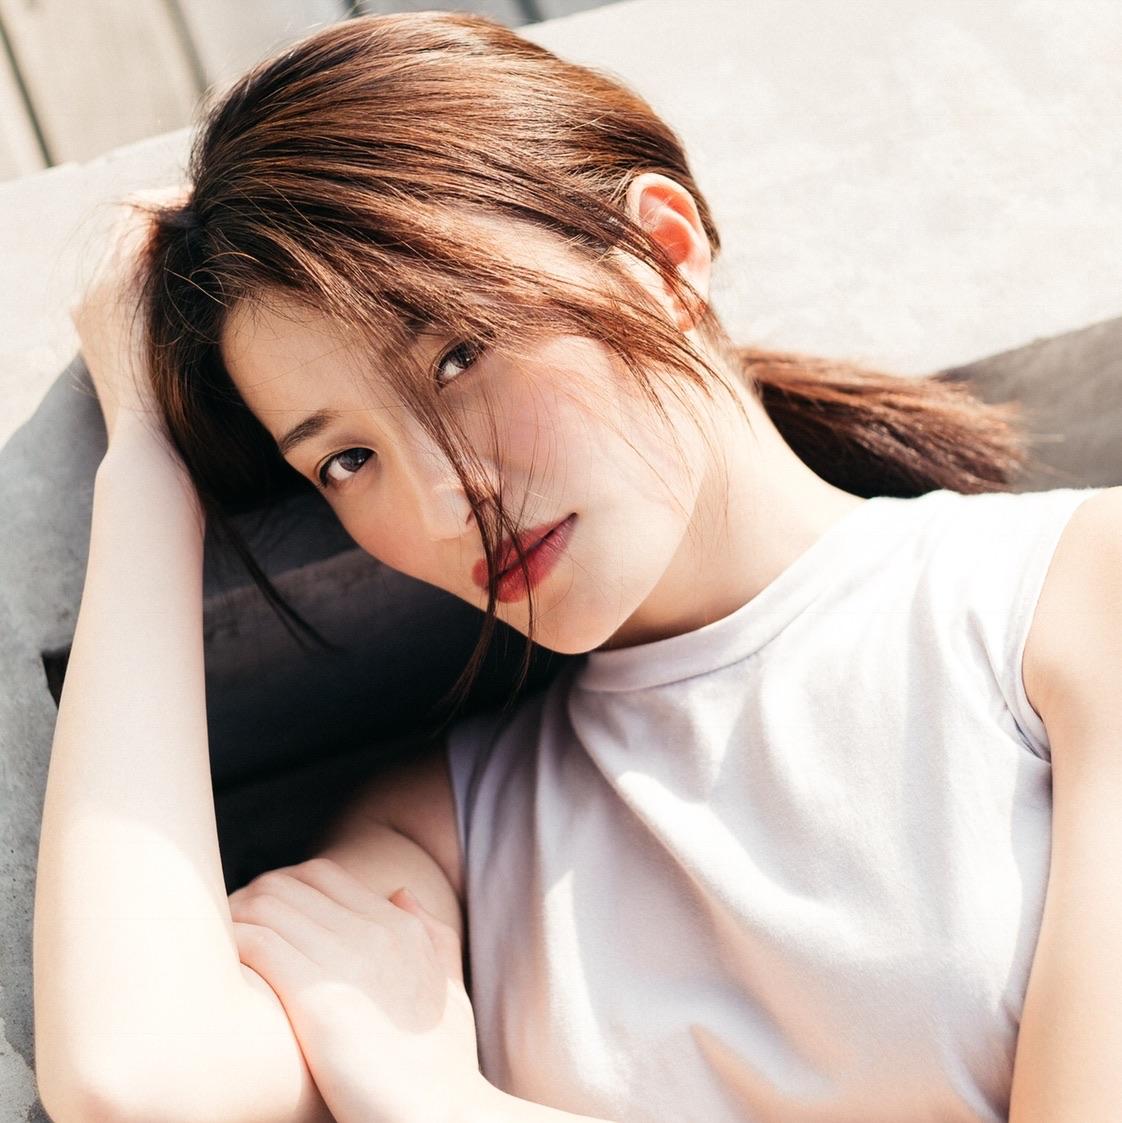 Sharon Ying